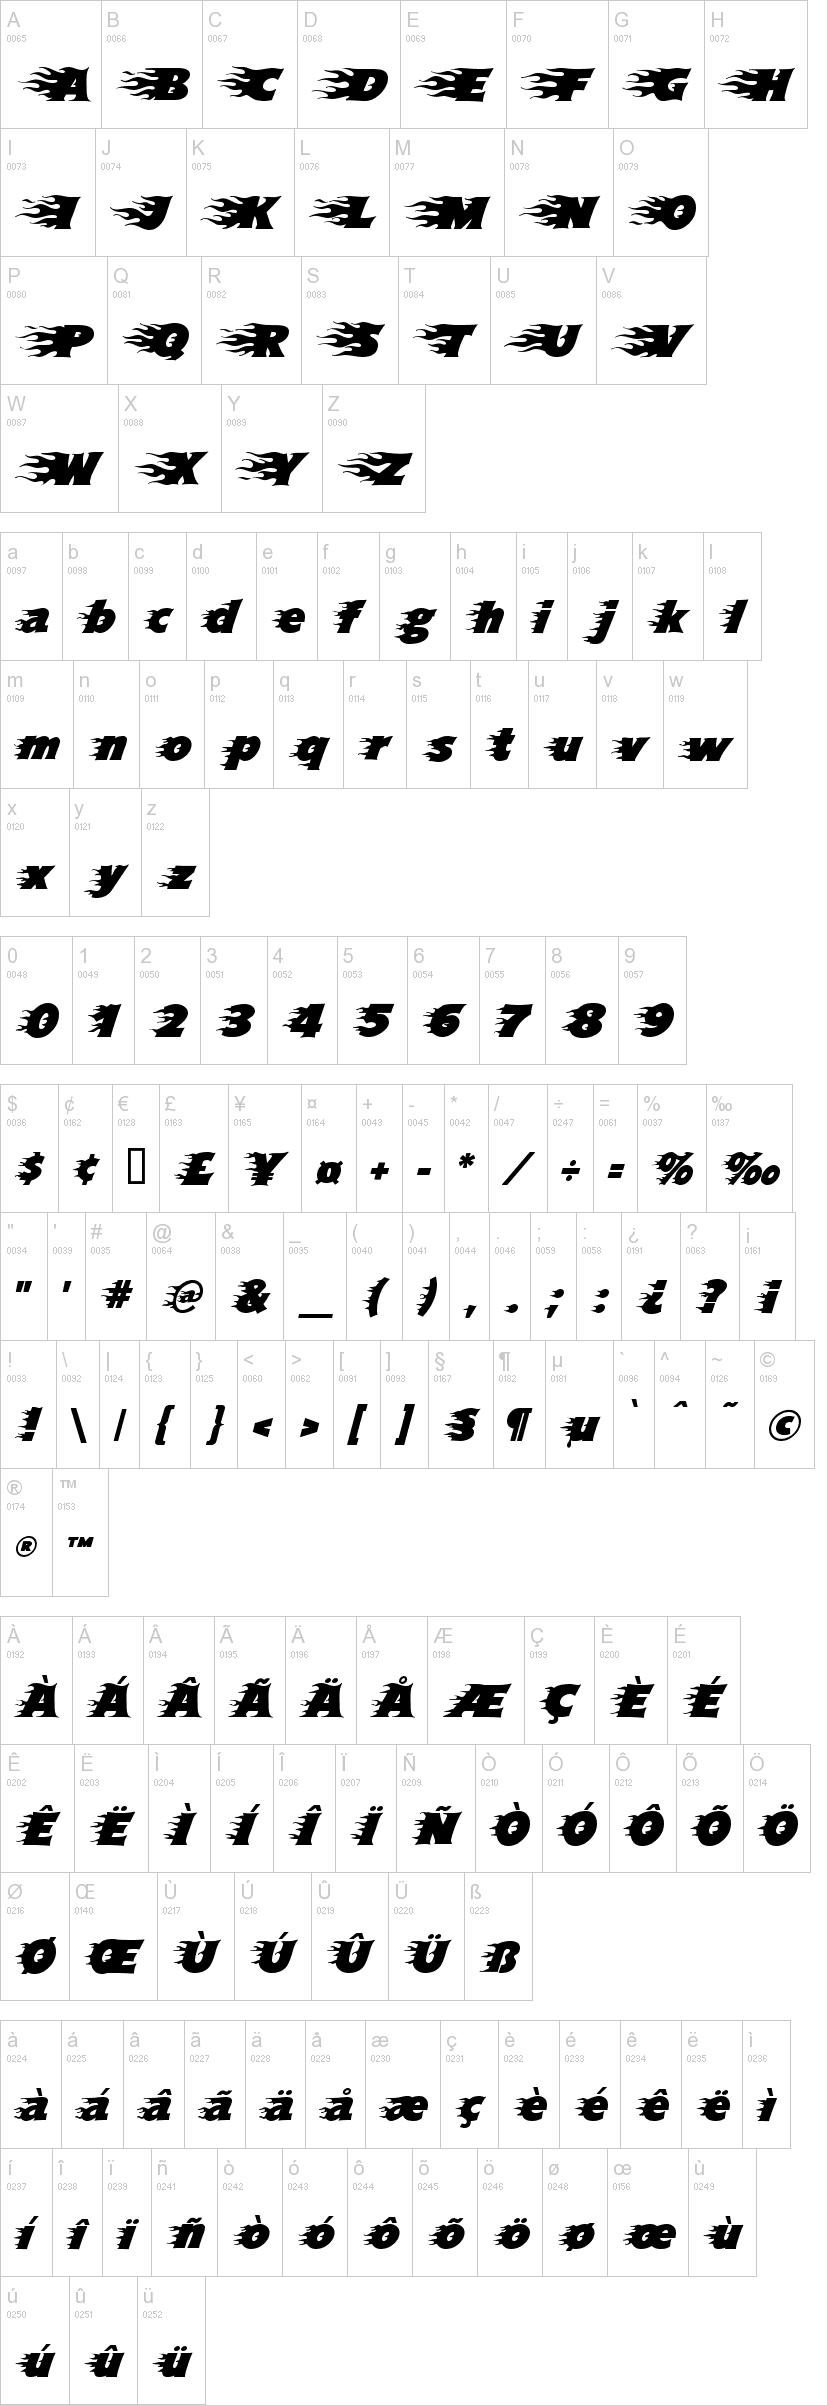 Blazed Font | dafont.com